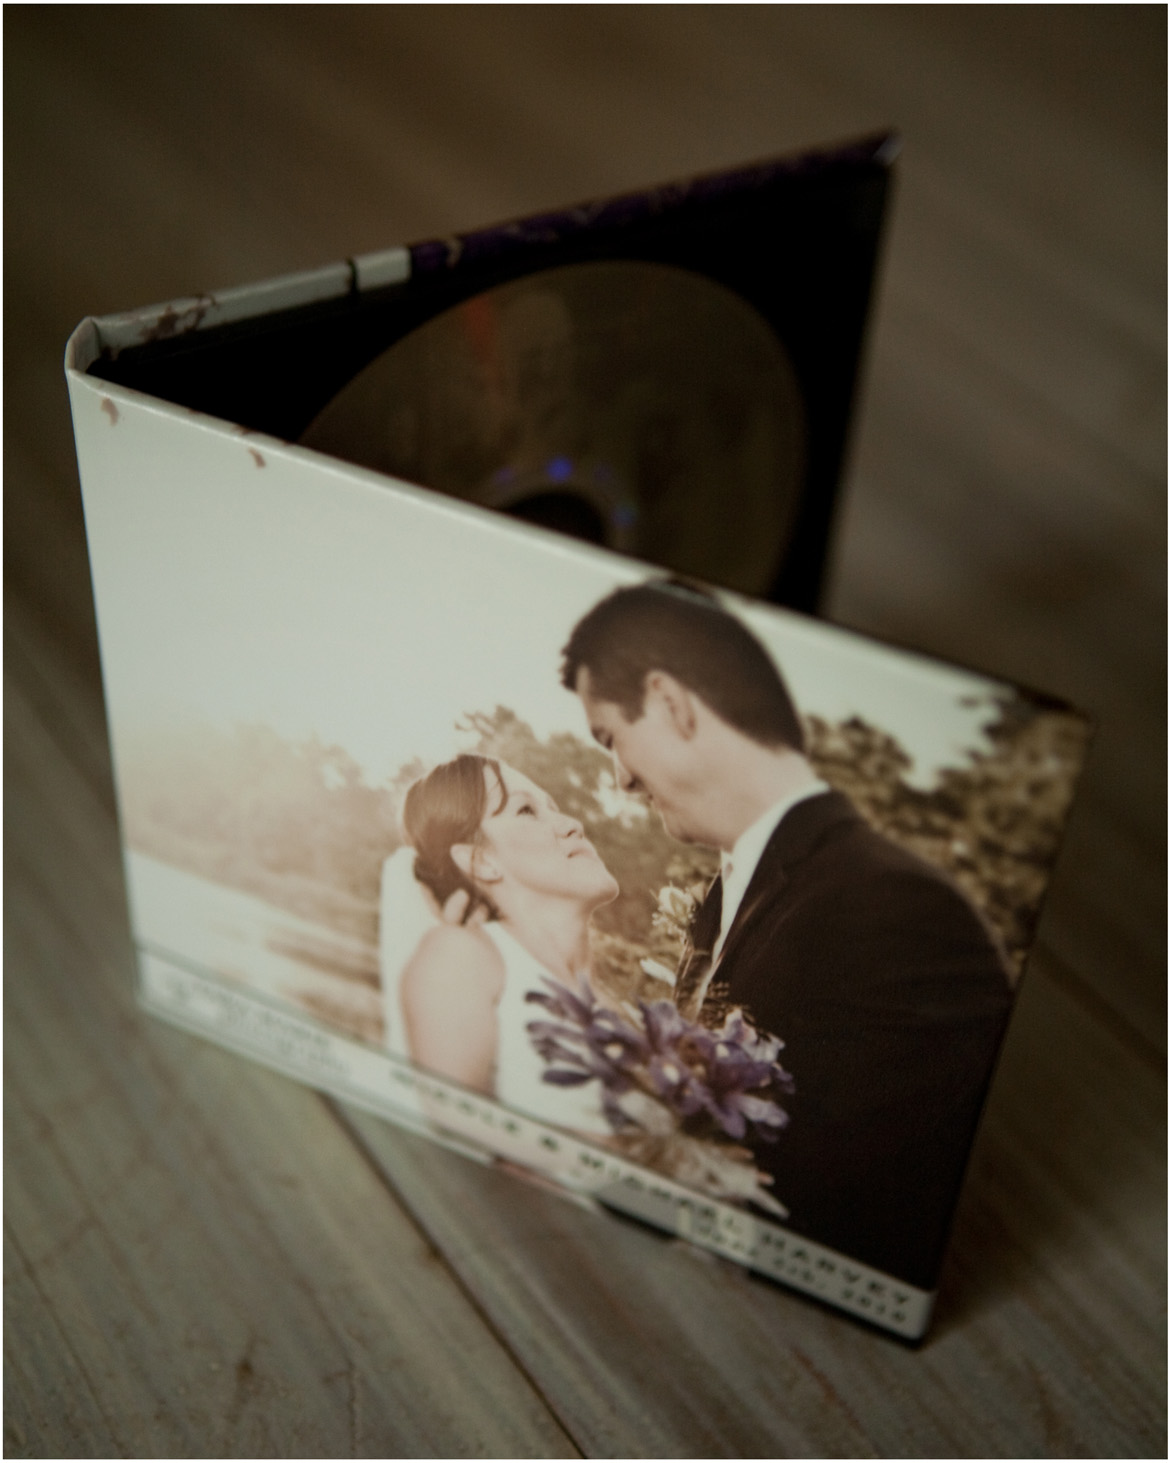 Tara Marie Photography: New custom Wedding CD cases and ...